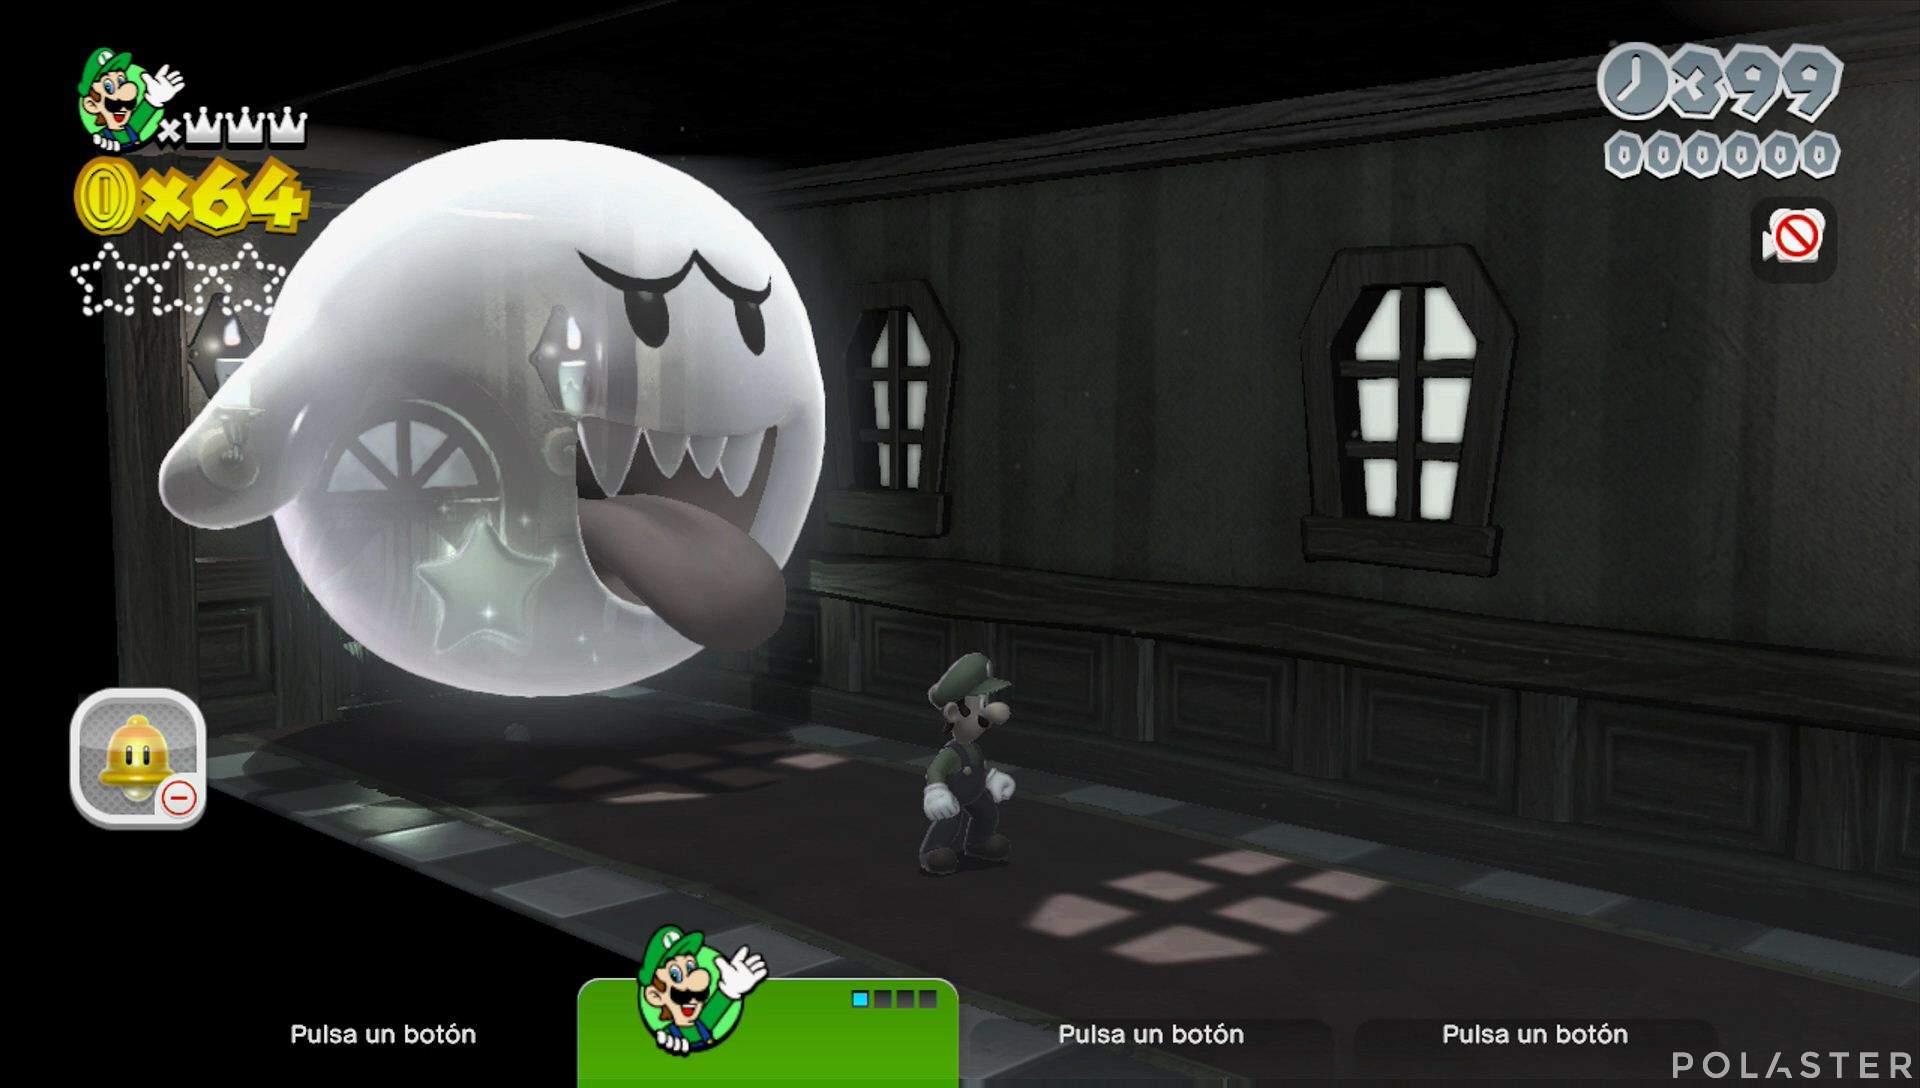 Super Mario 3D World Mundo Flor-6 Estrella 1